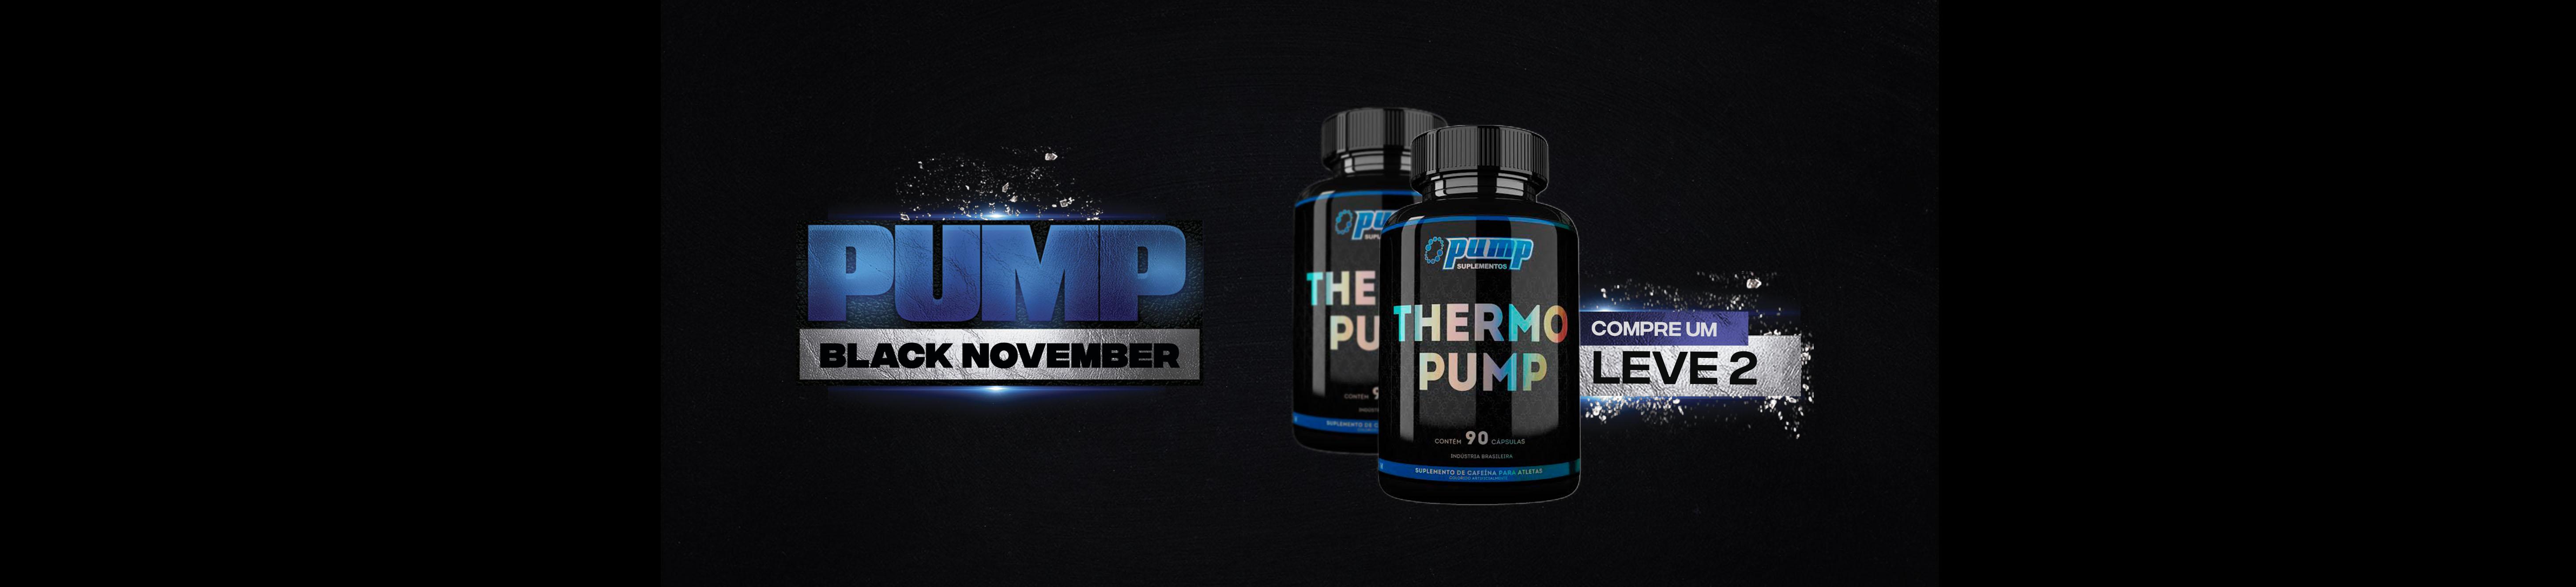 Black November - Thermo Pump